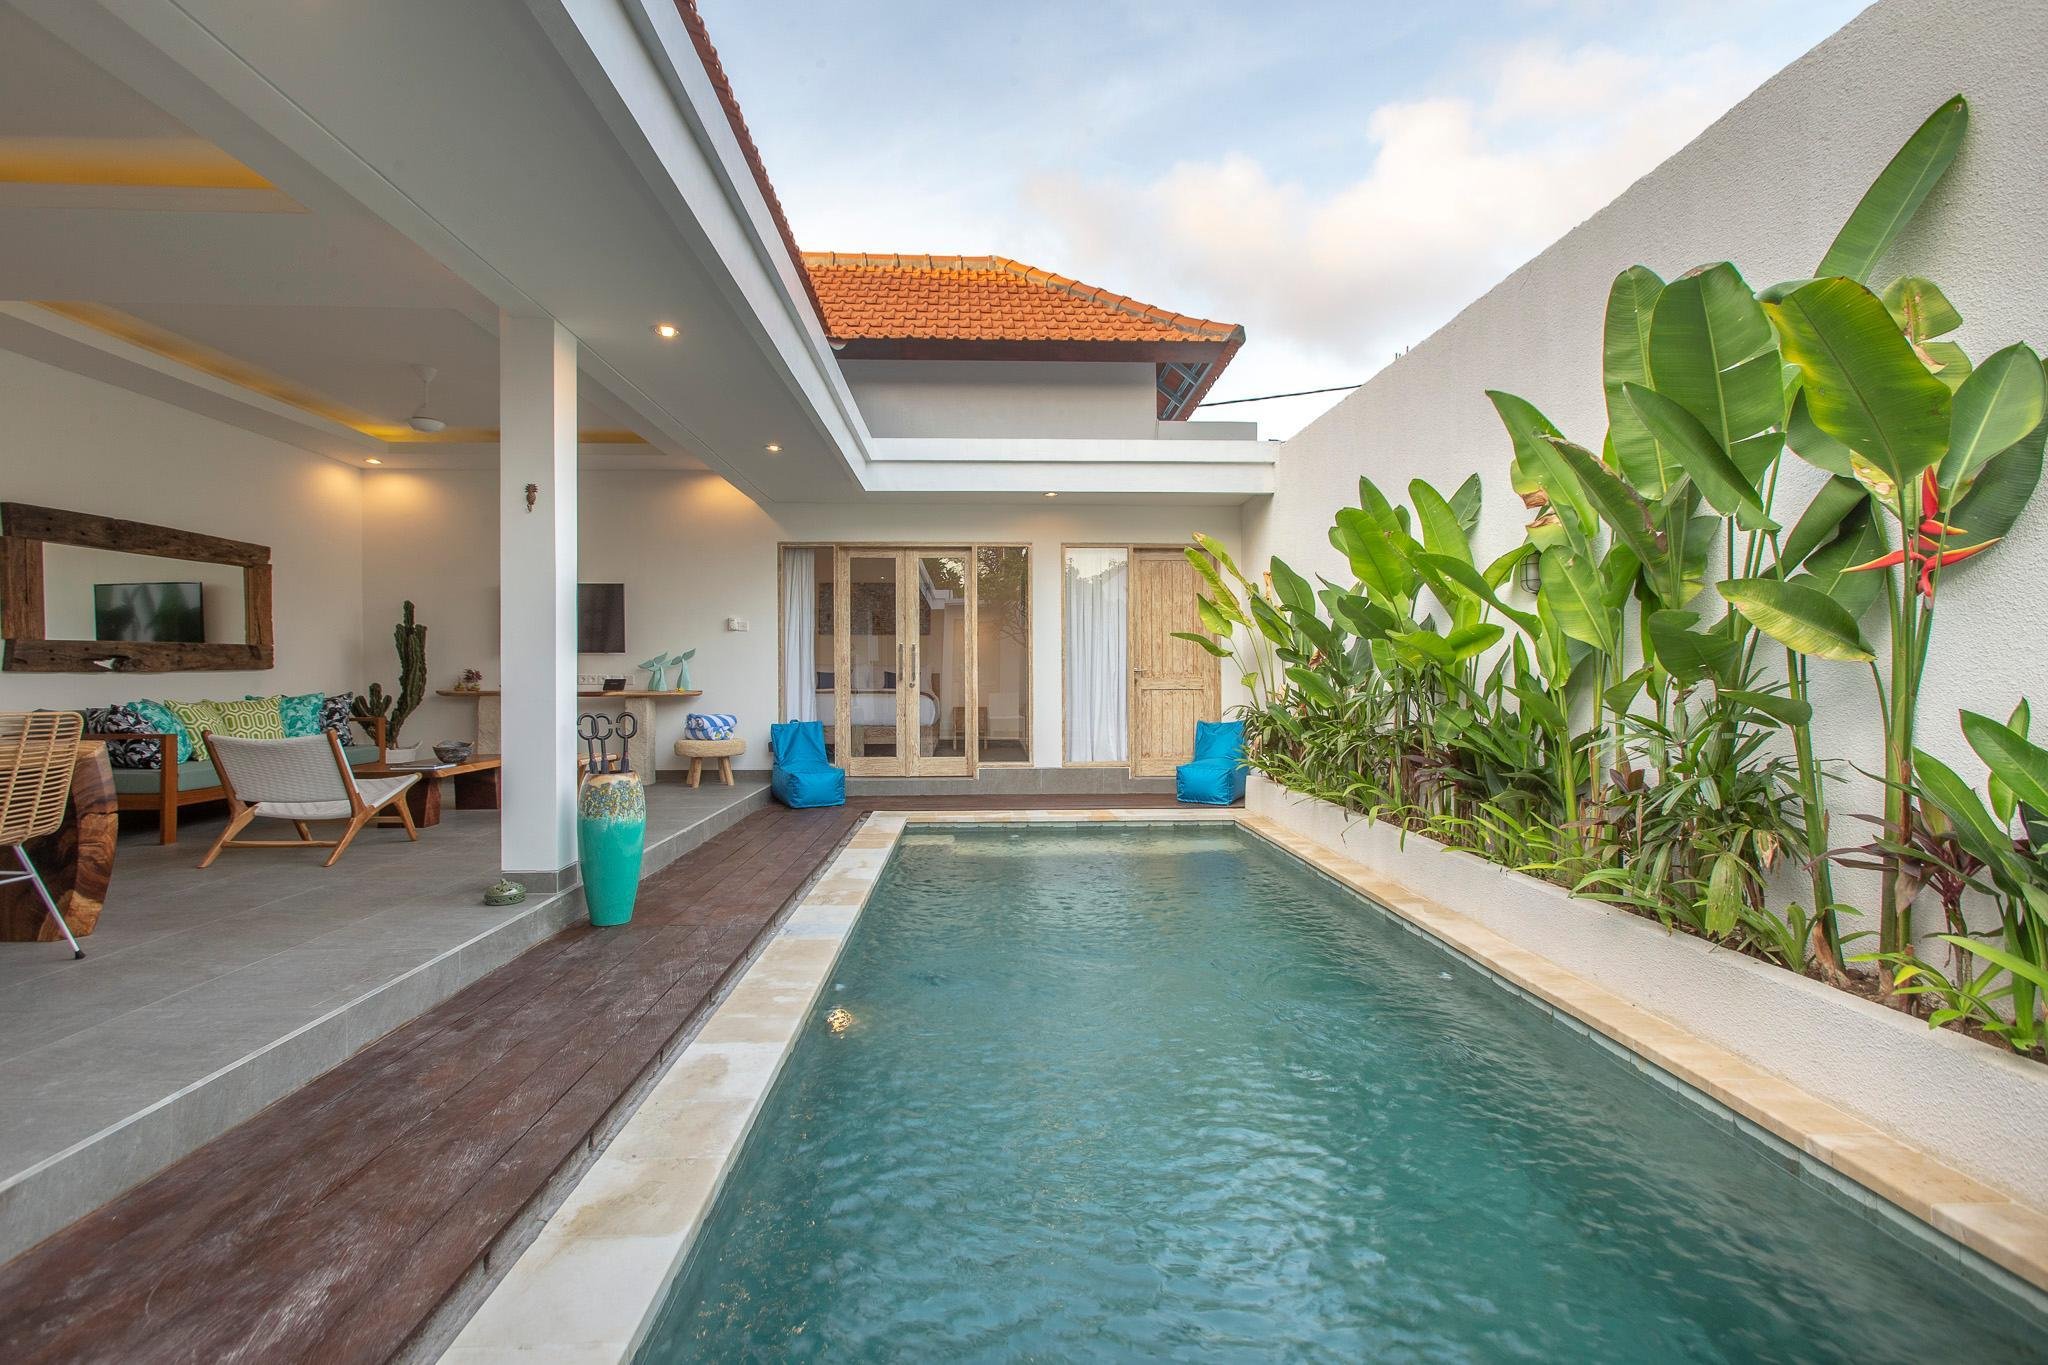 2br Villa Arif Your Bali Home In Seminyak Entire Villa Deals Photos Reviews